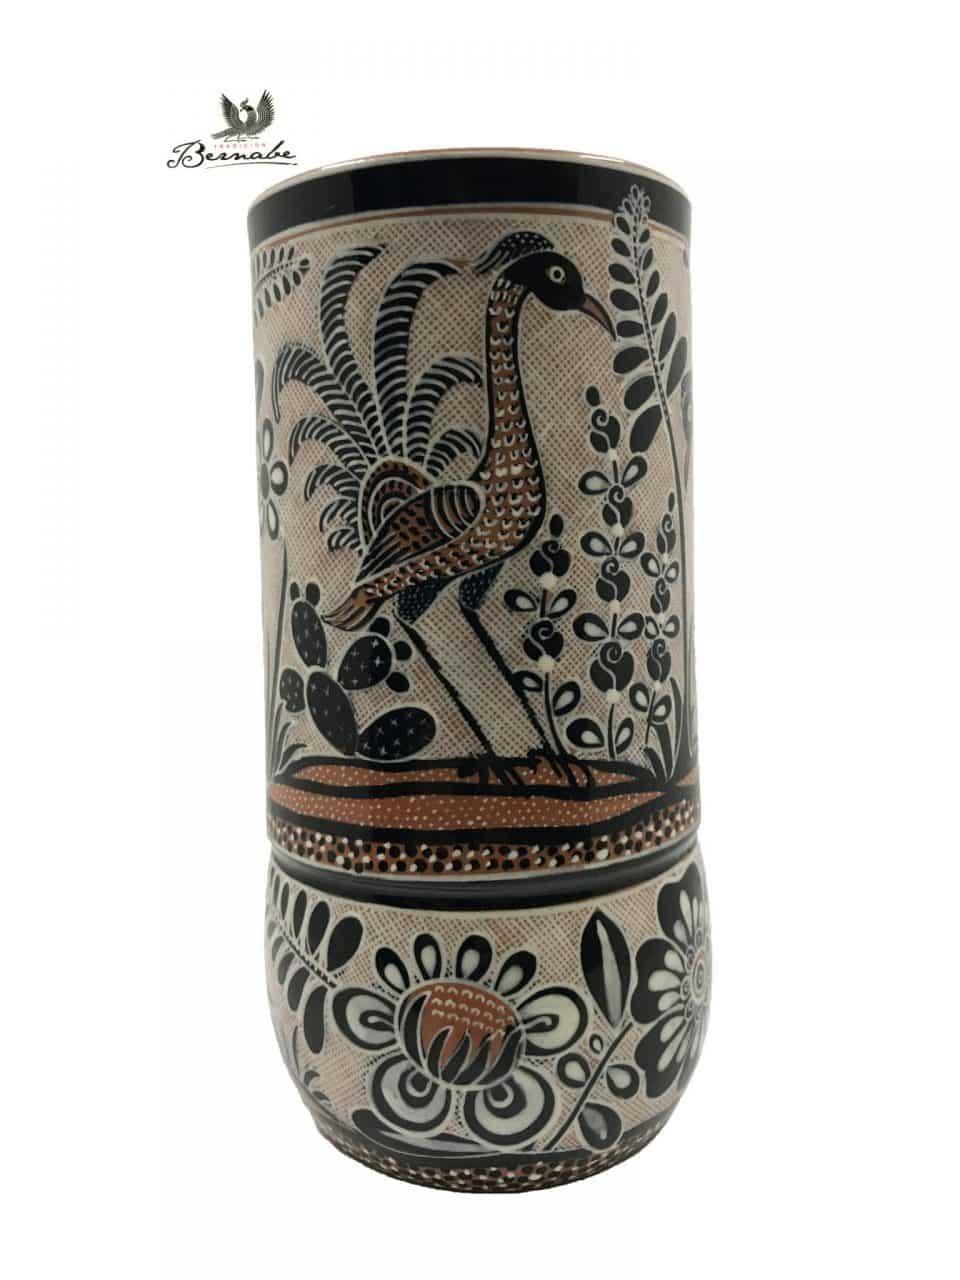 Mug (Petatillo Pottery) (2)